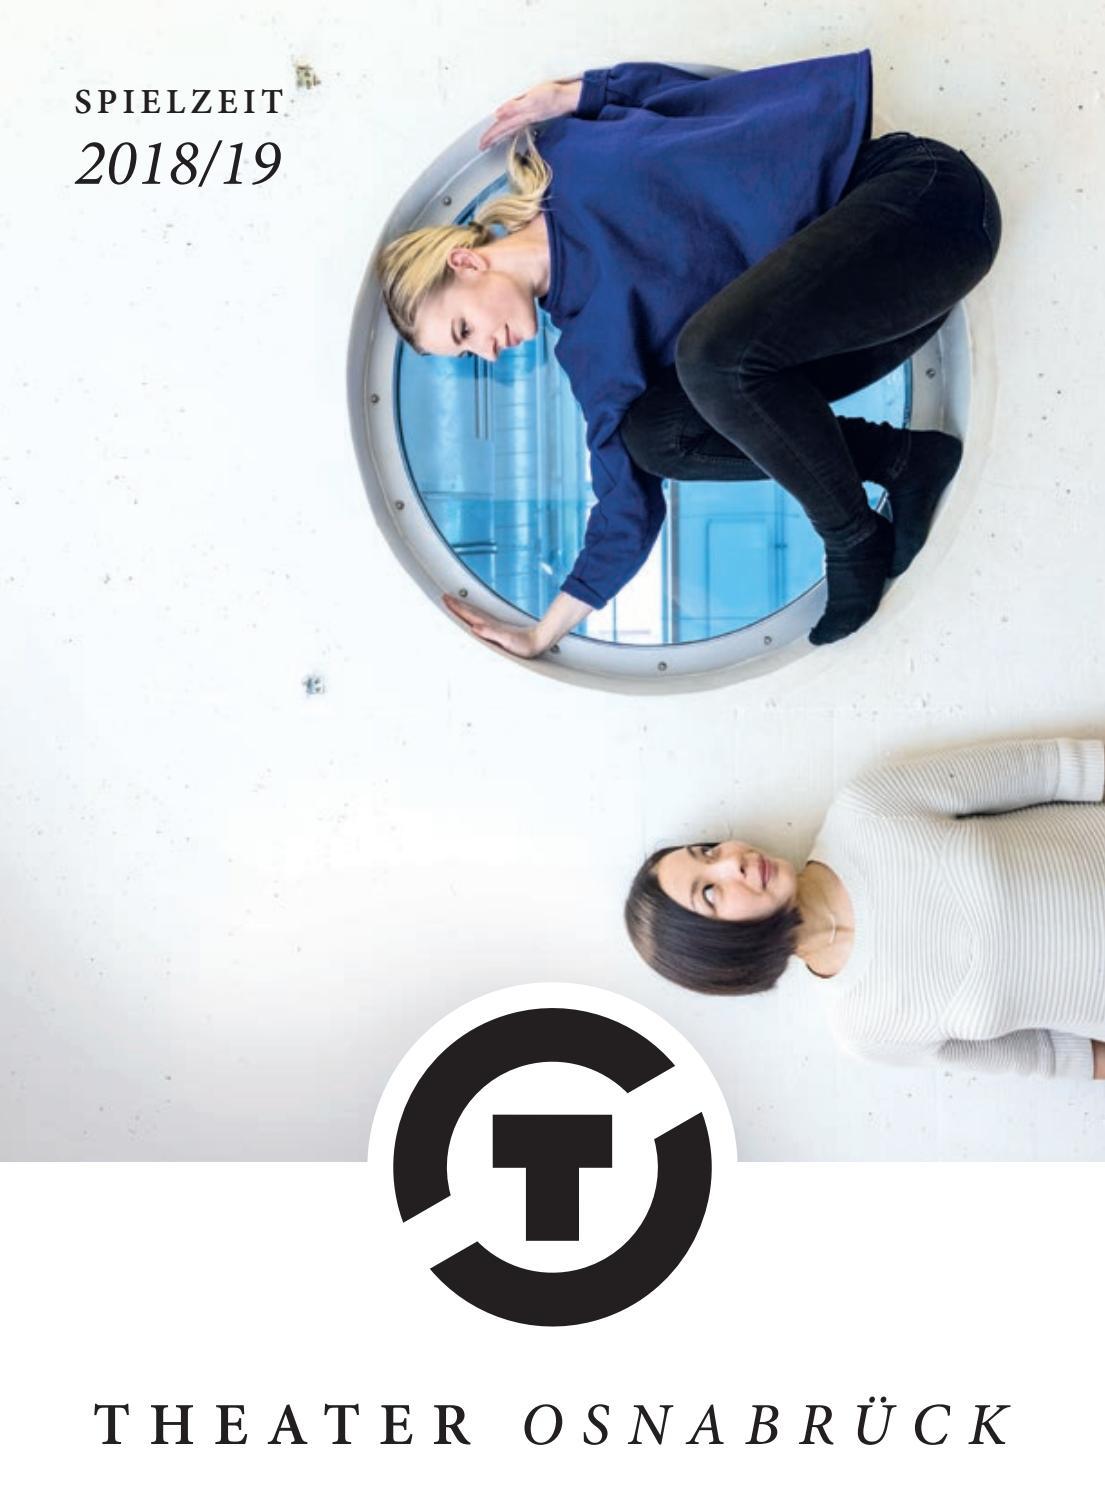 Theater Osnabrück Spielzeit 2018/19 by Theater Osnabrück - issuu